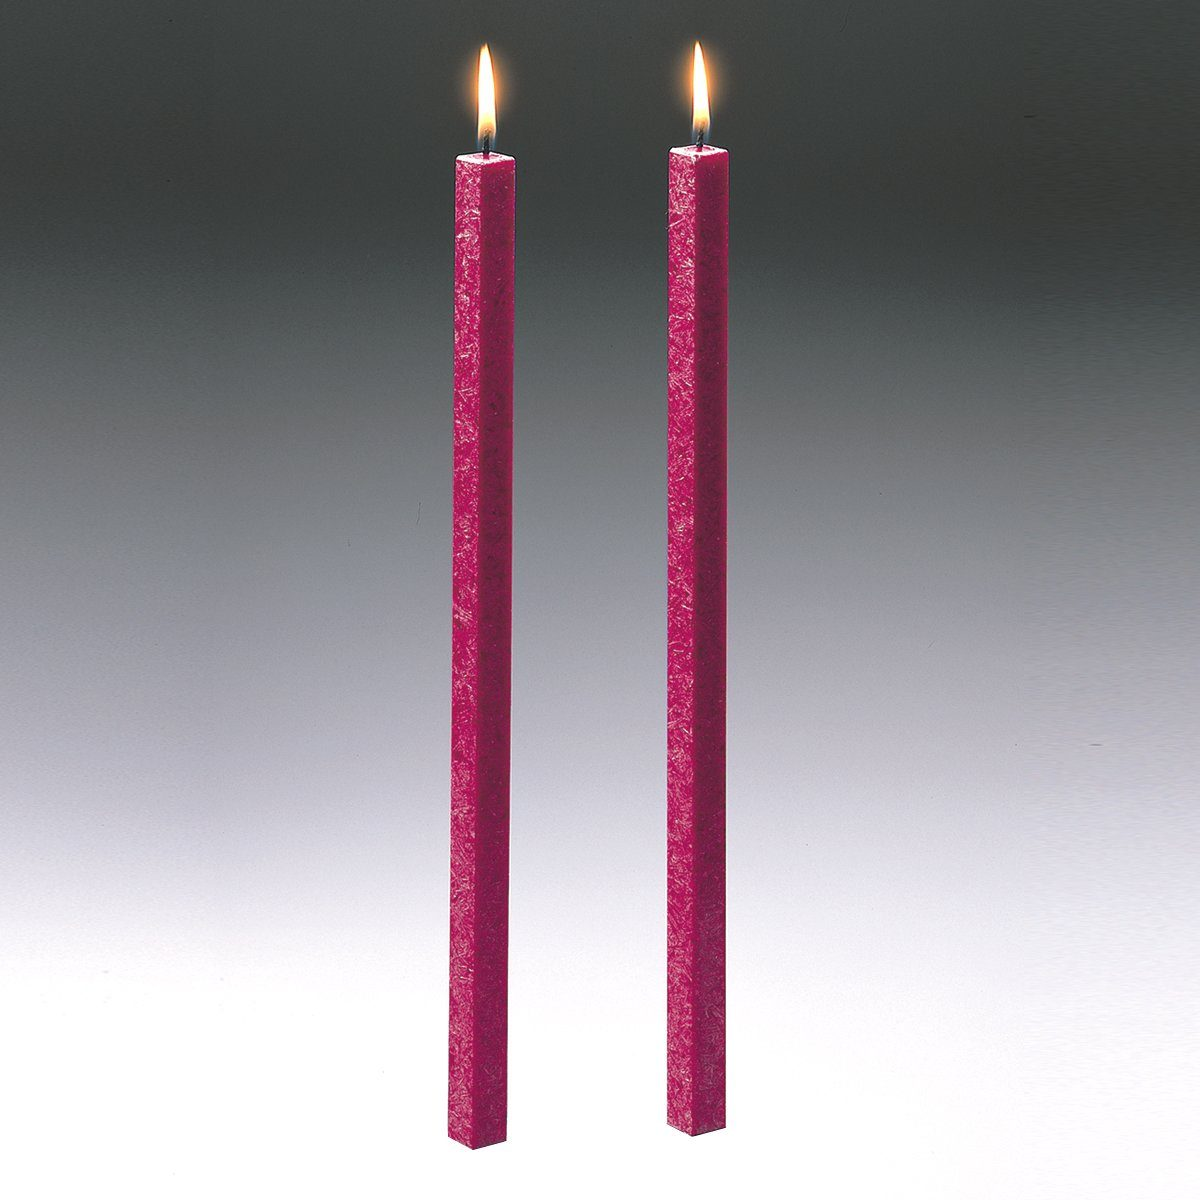 Amabiente Amabiente Kerze CLASSIC fuchsia 40cm - 2er Set